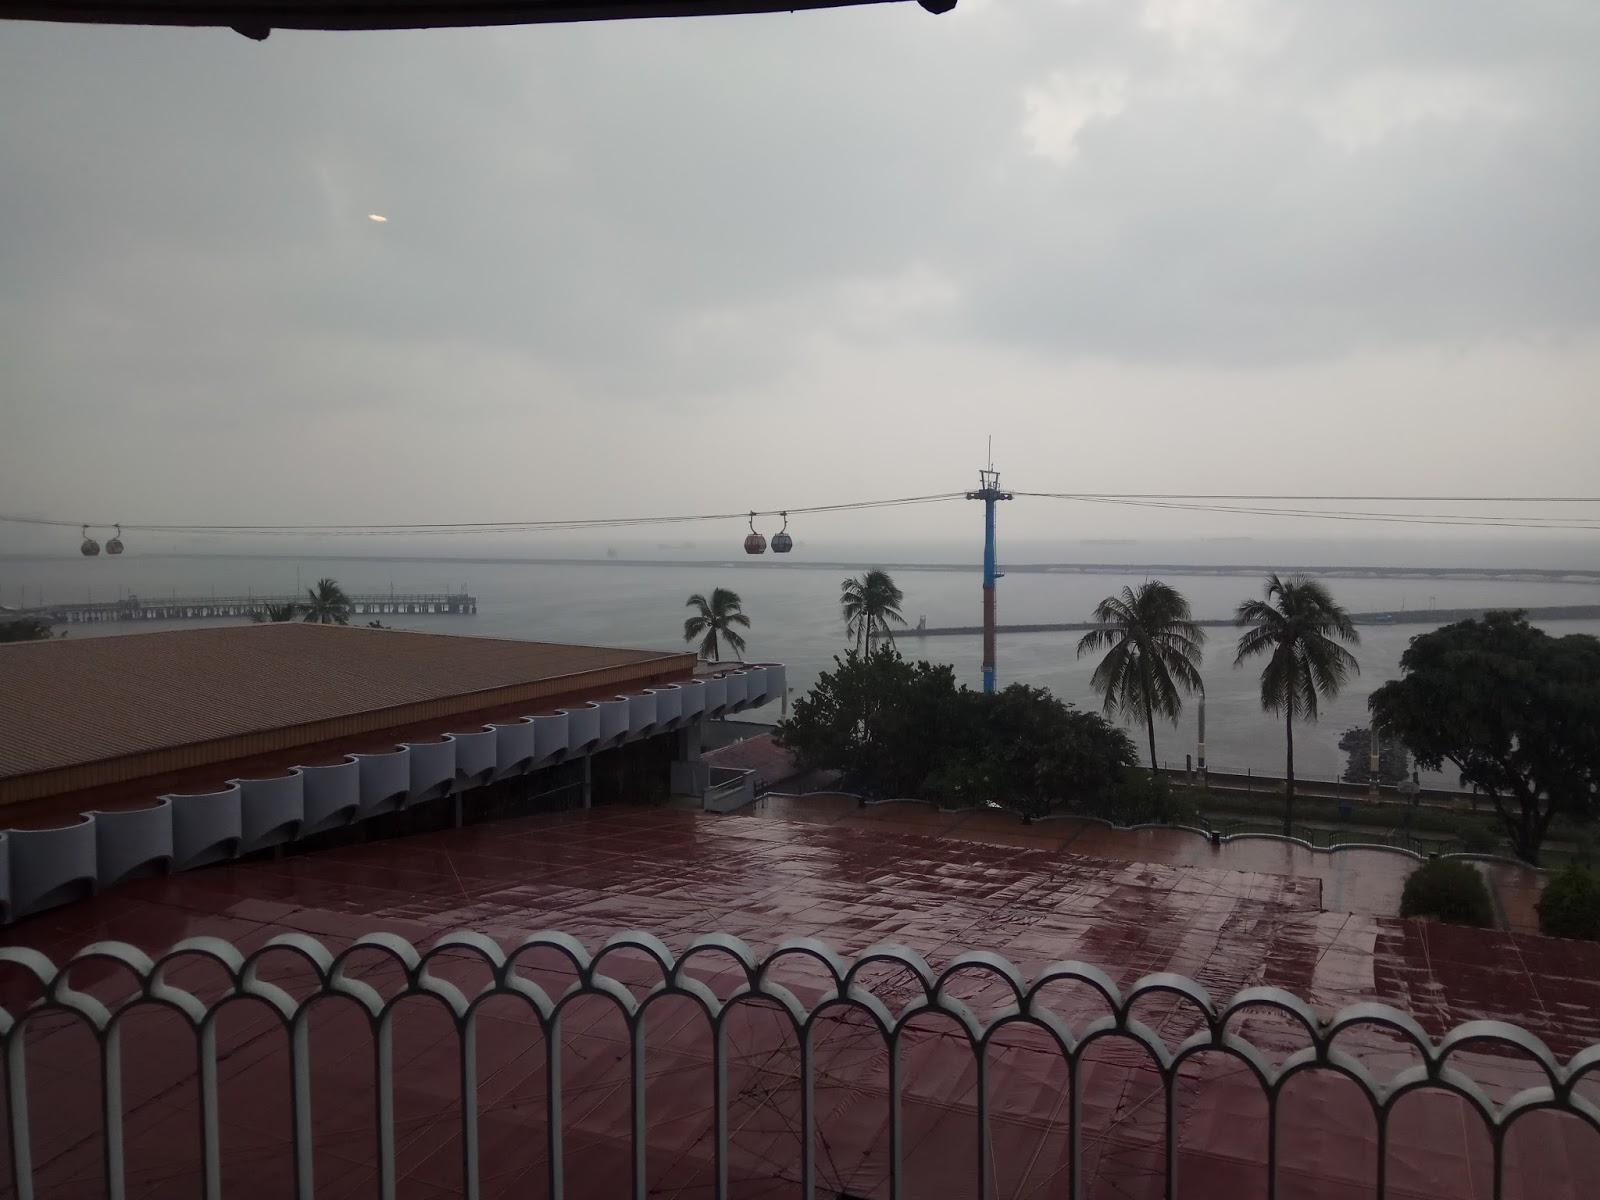 berwisata pengalaman menginap di hotel mercure ancol rh rek ayo rek blogspot com